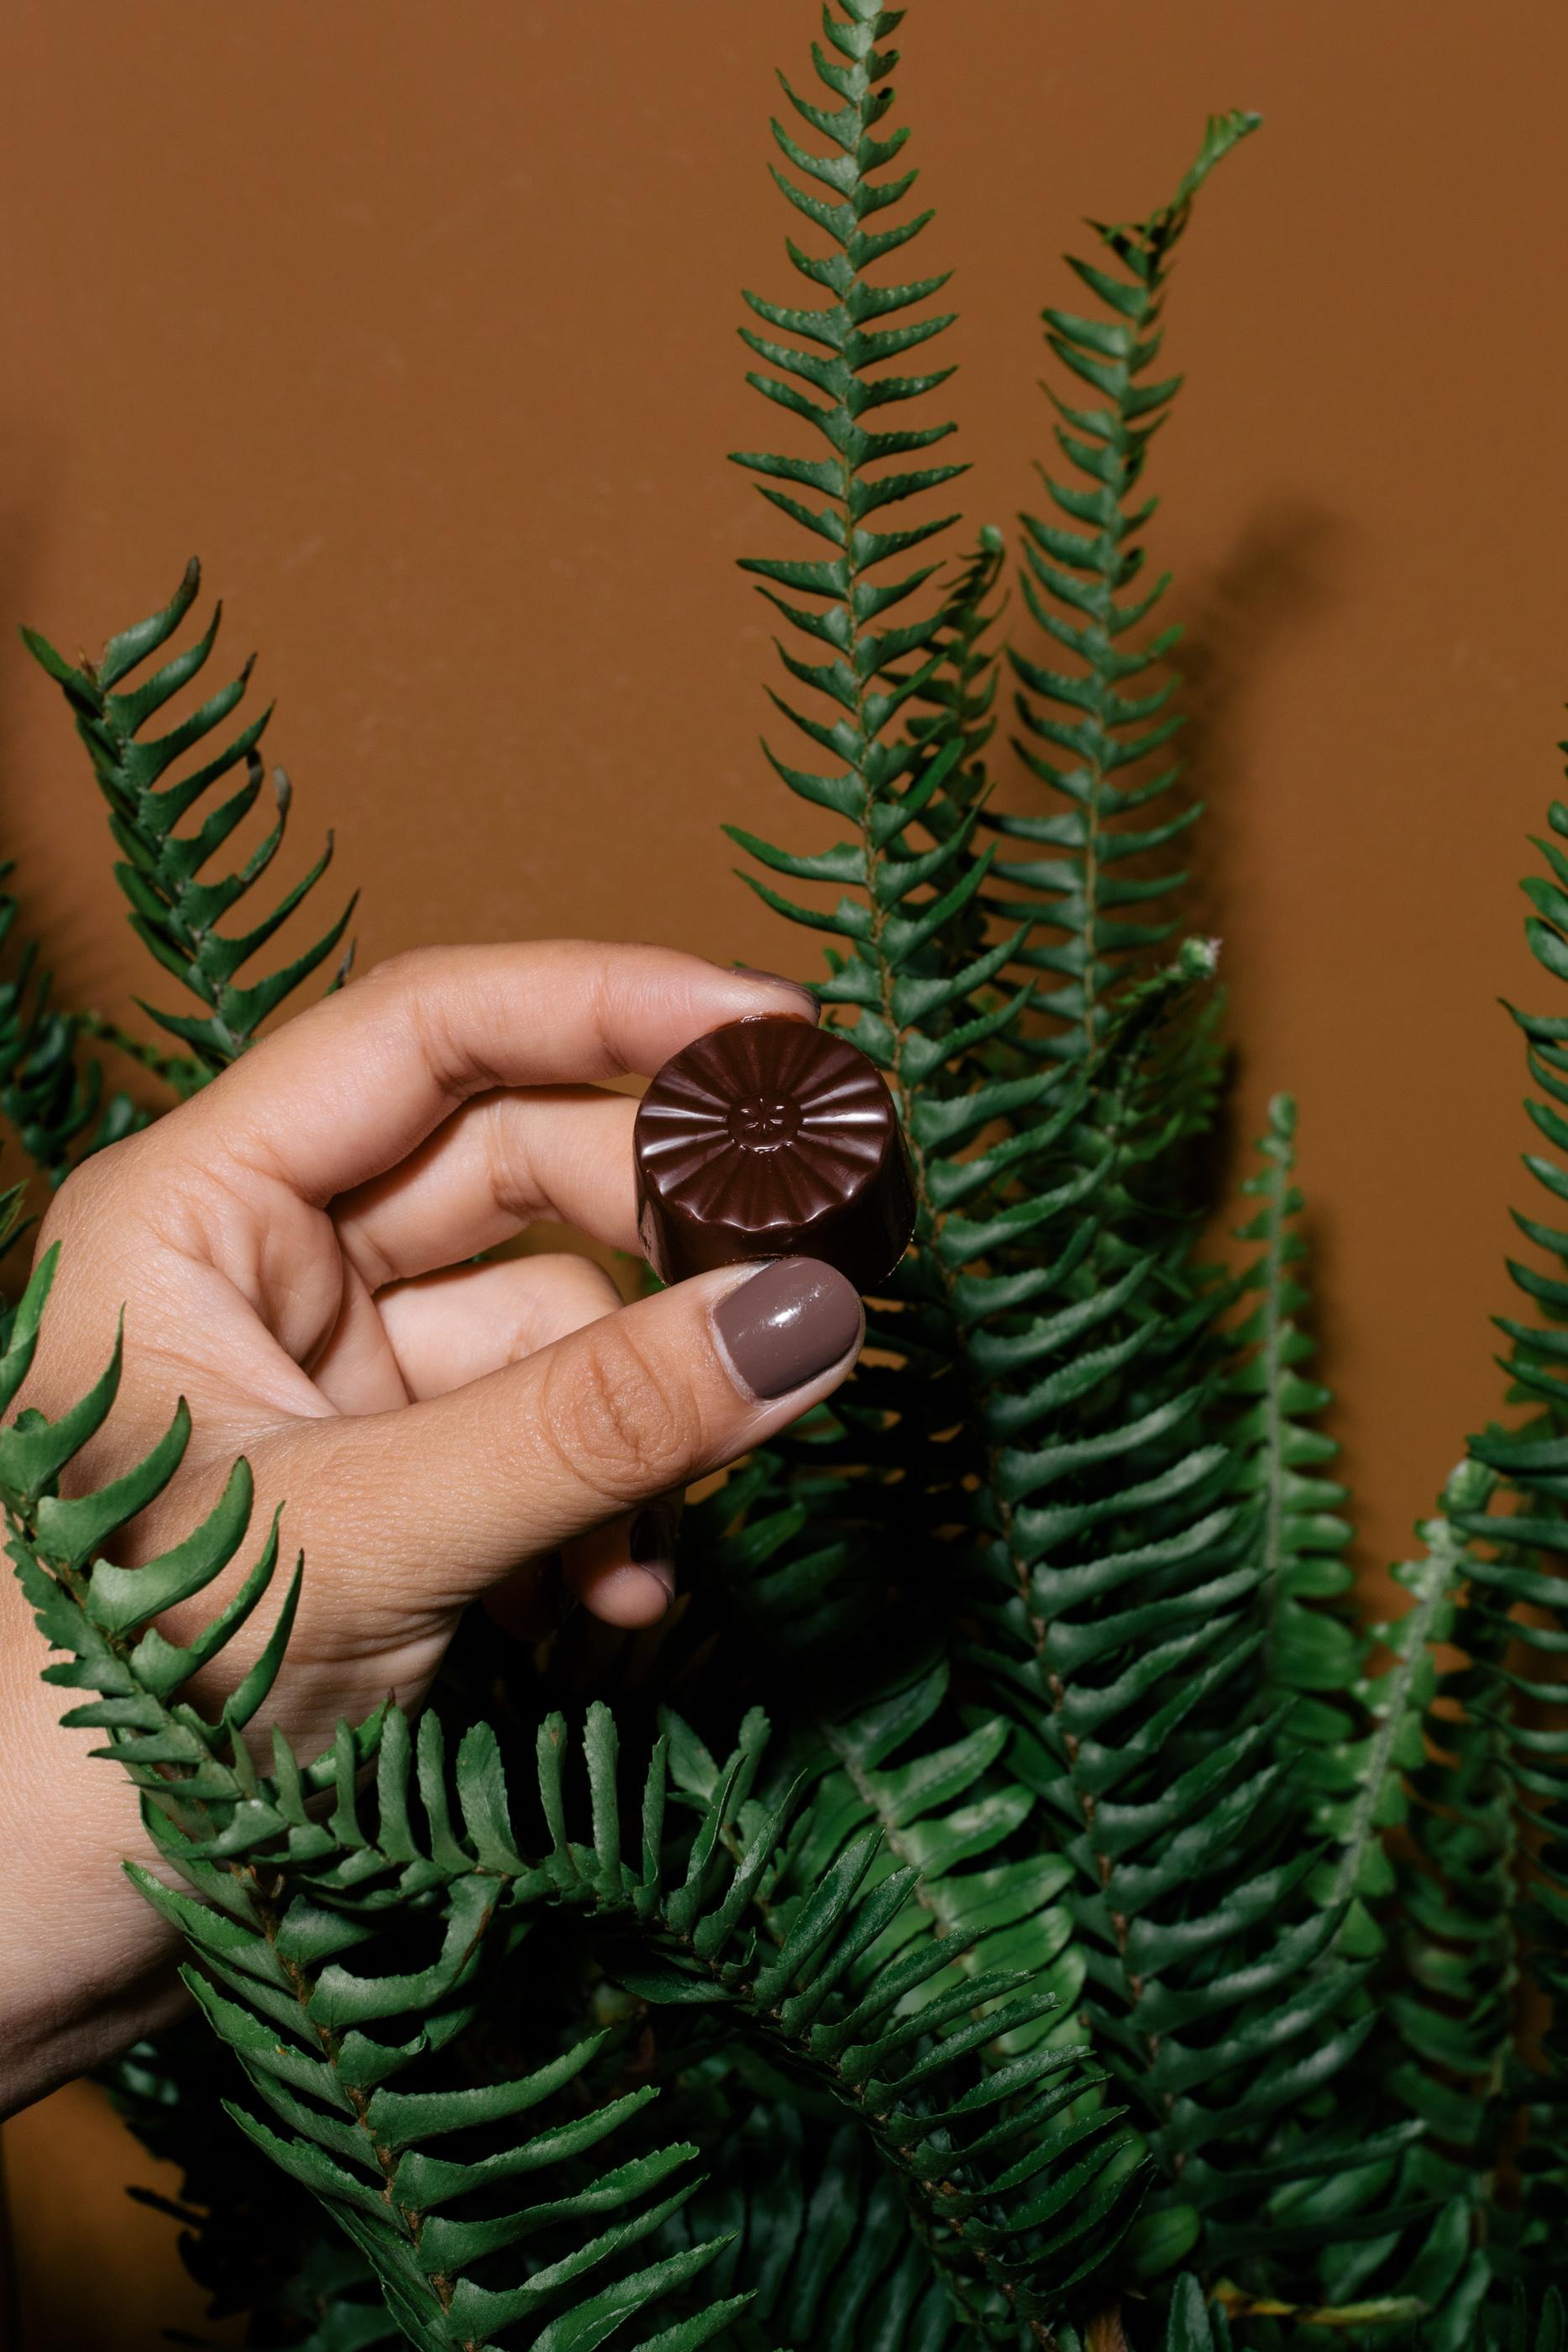 Maison_Marou_Chocolate_Dior_thatsluminous_web-18.jpg